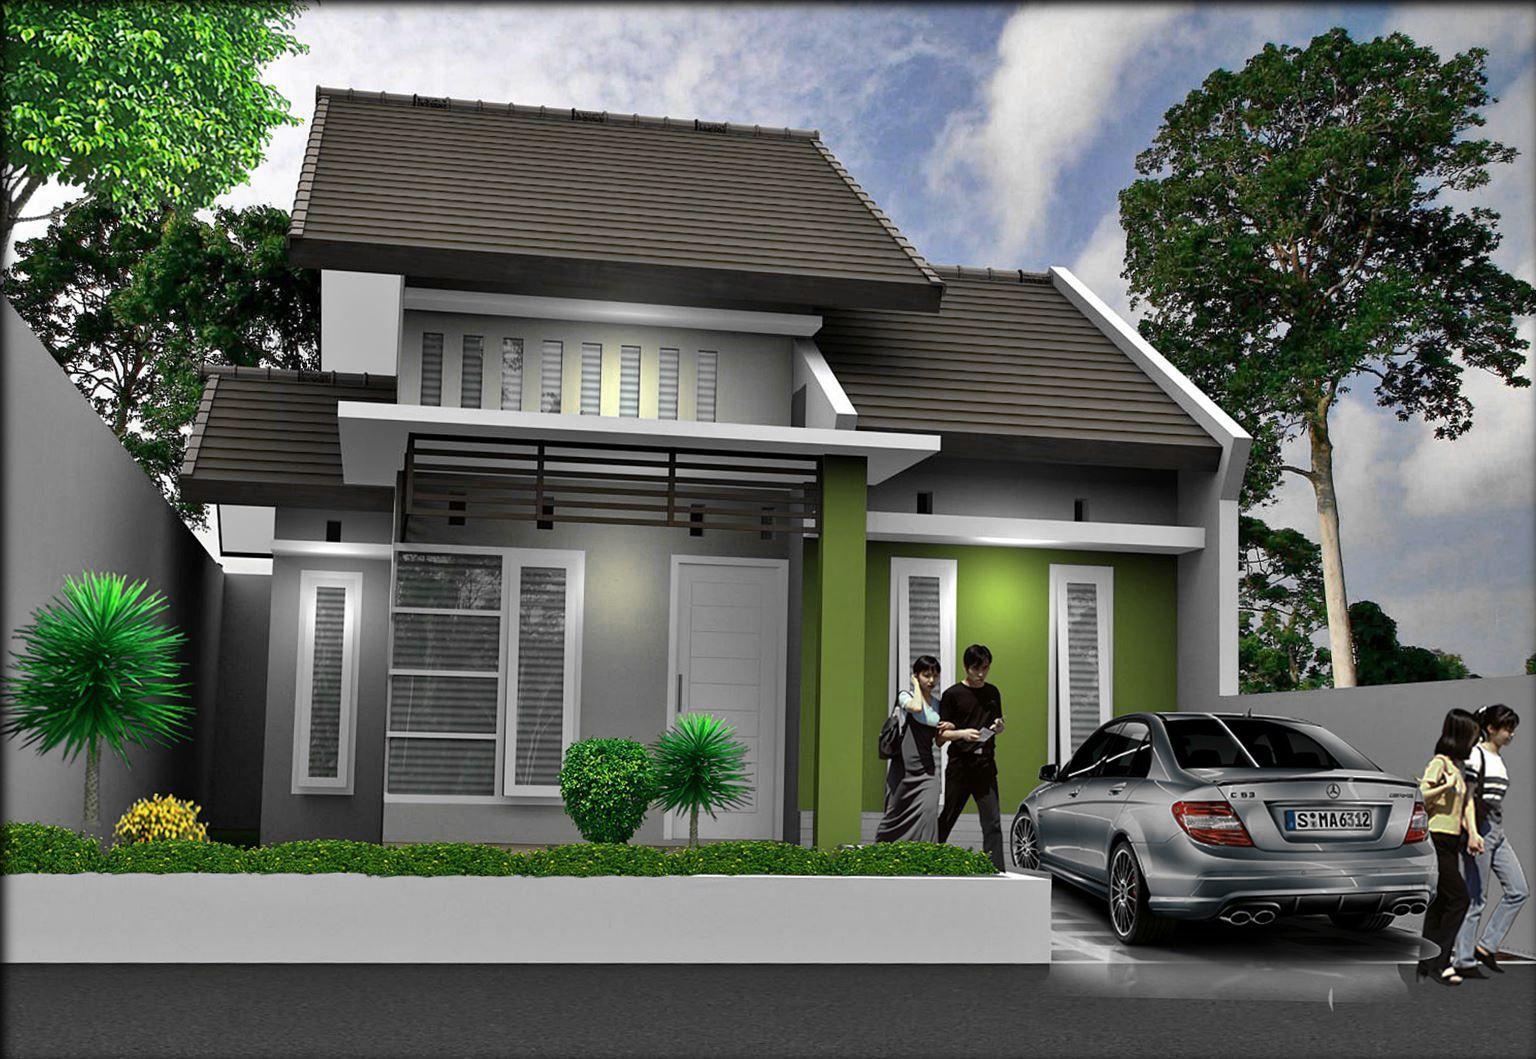 30 Reka bentuk rumah moden sebagai inspirasi untuk anda (9)